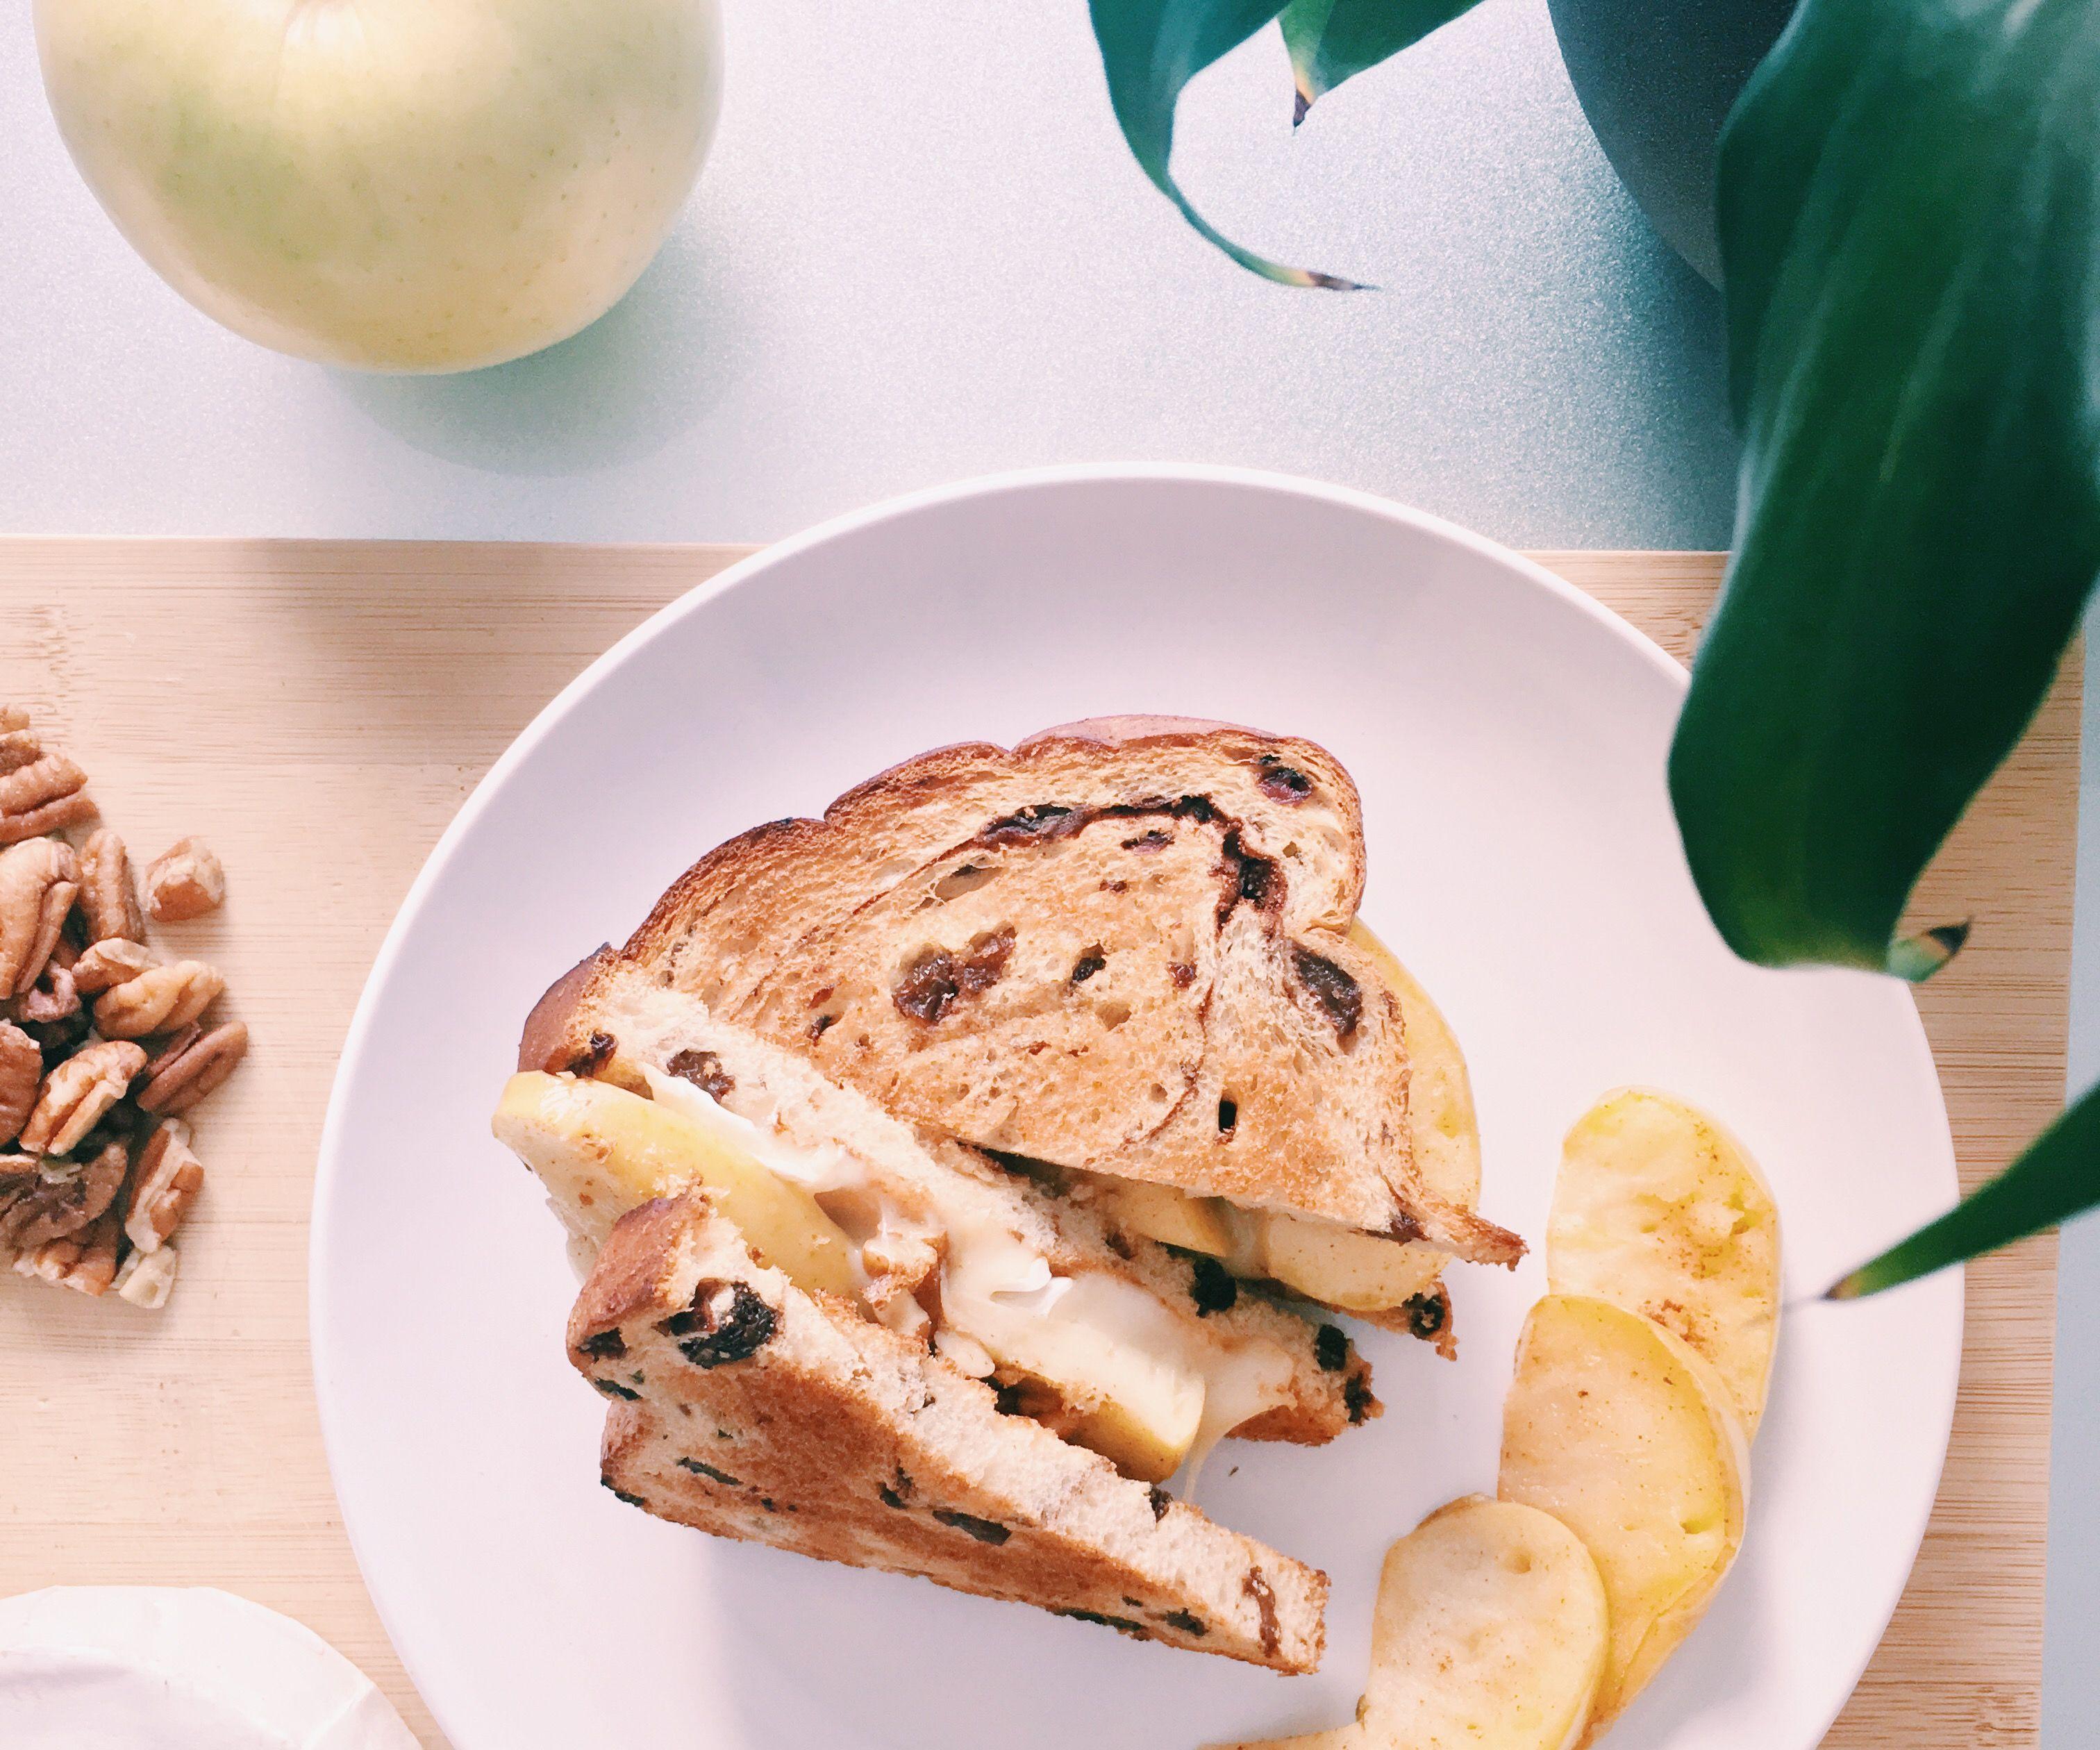 RECIPE | BRIE CHEESE & APPLE SANDWICH